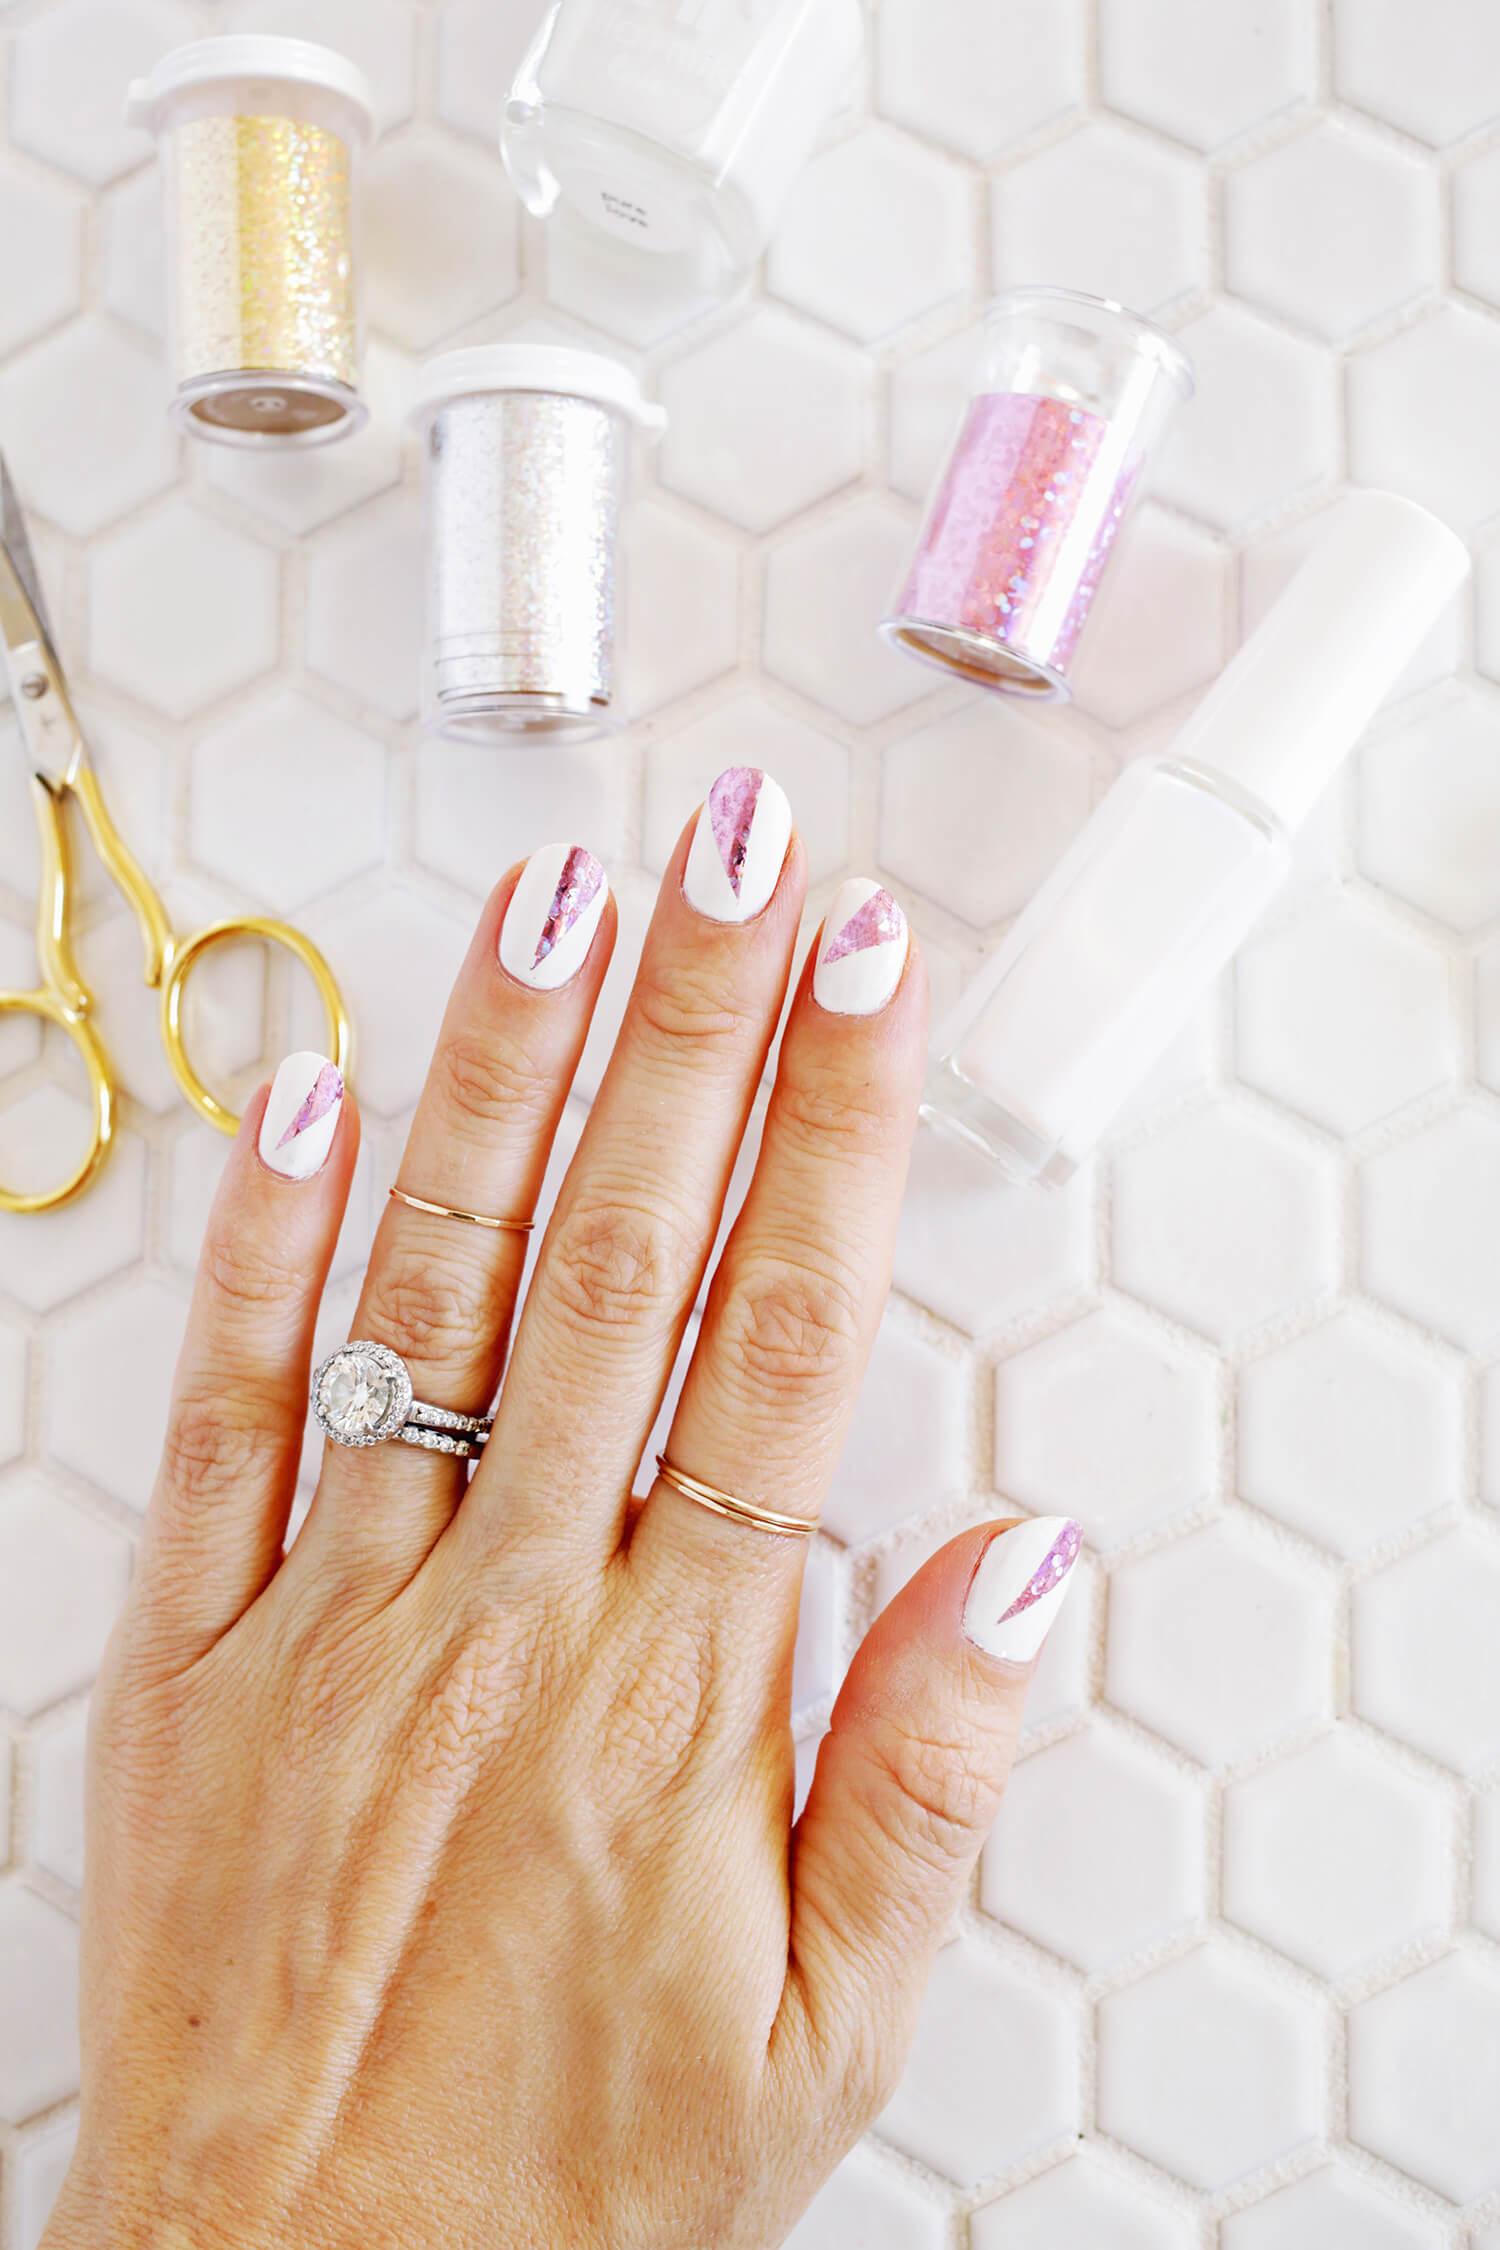 DIY Foil Manicure (click through for tutorial)